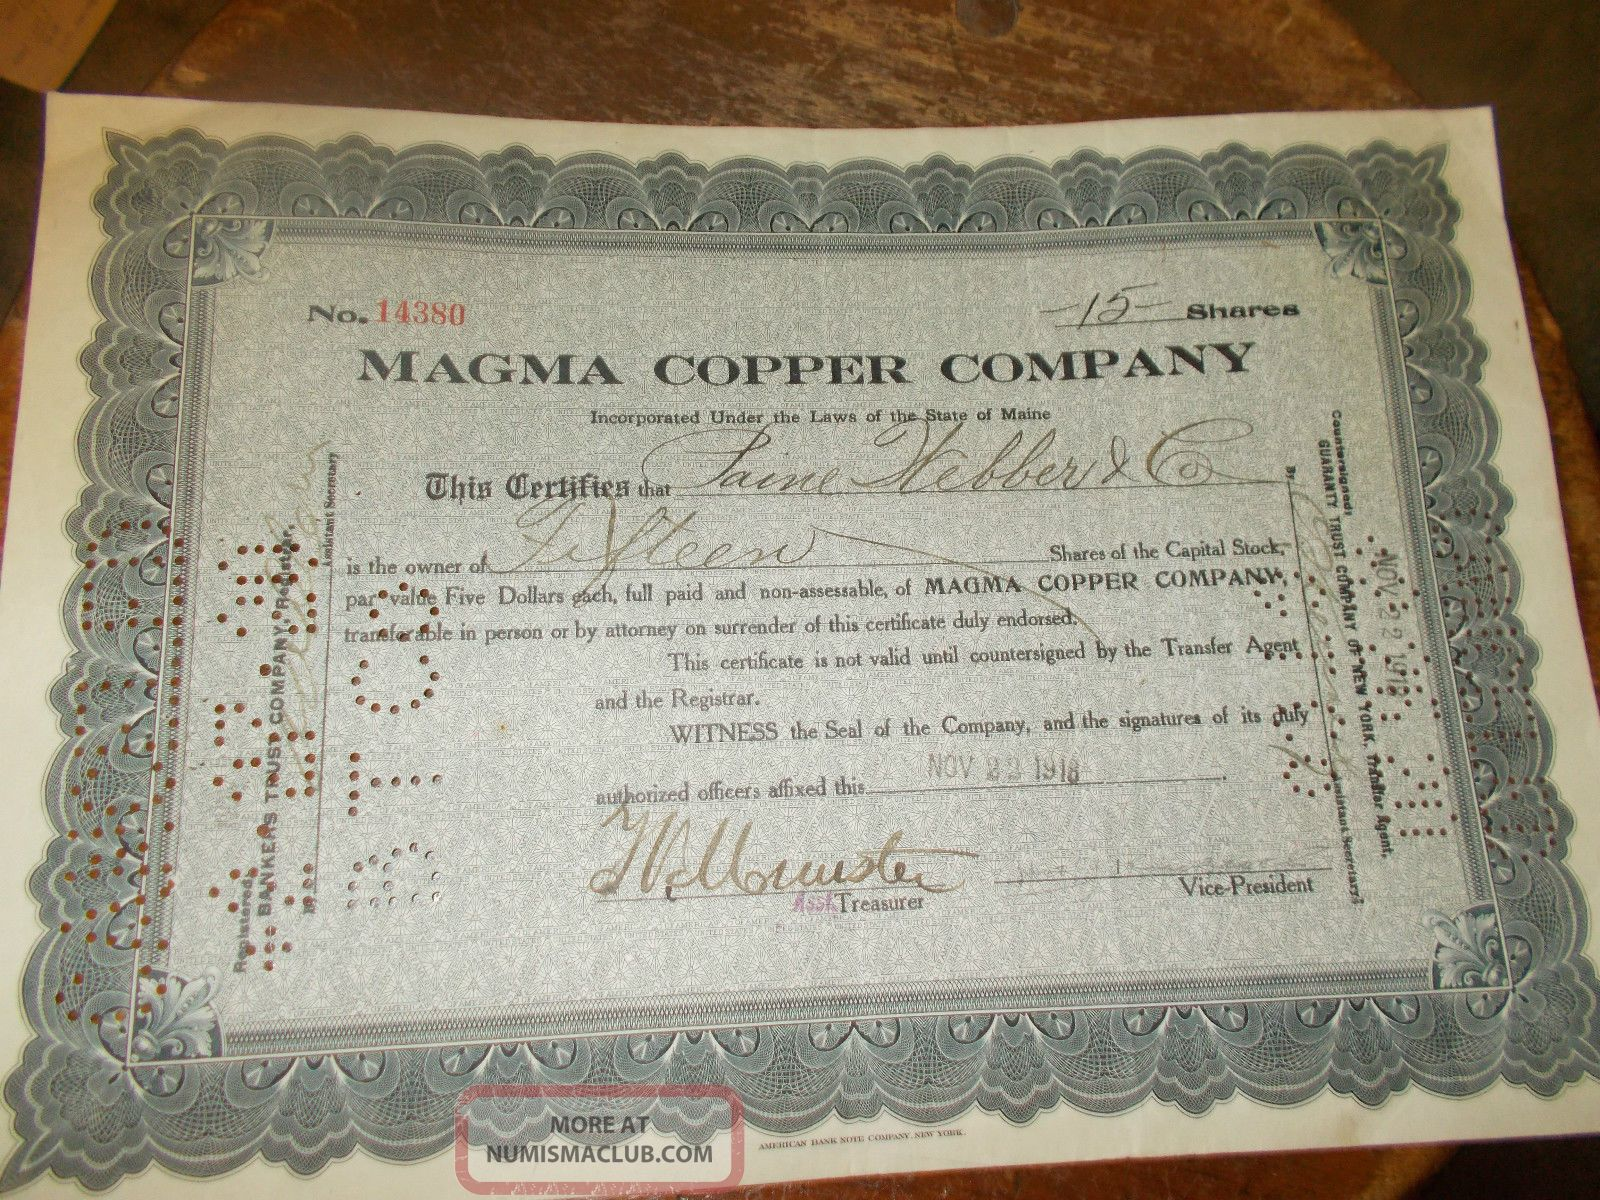 Magma Copper Company Stocks & Bonds, Scripophily photo